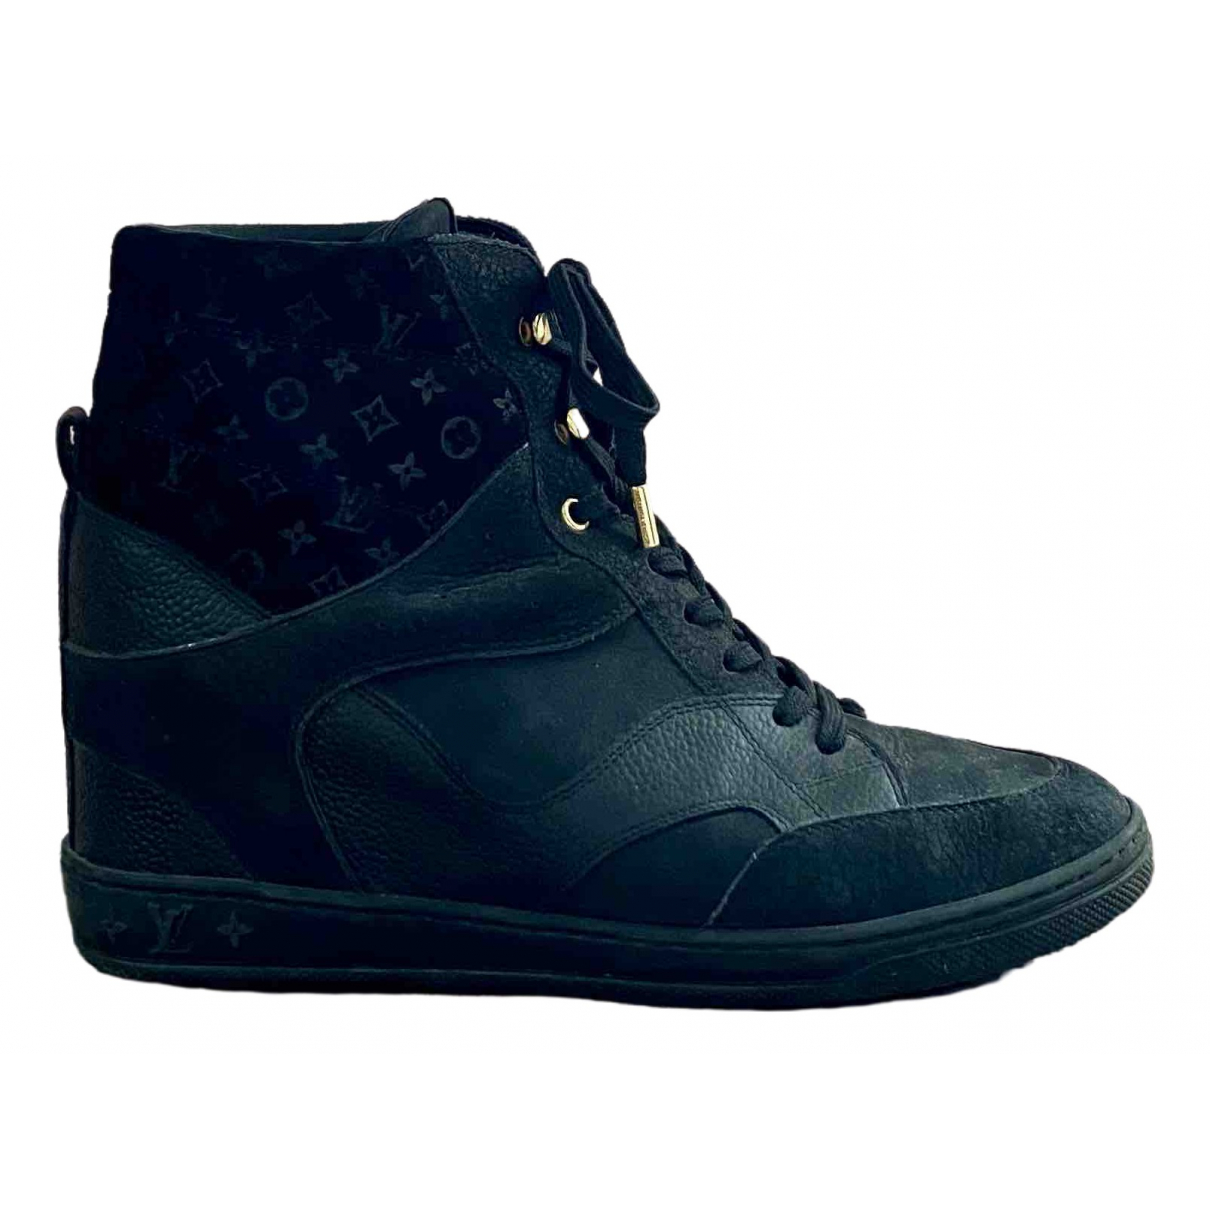 Louis Vuitton \N Black Leather Trainers for Women 40 EU